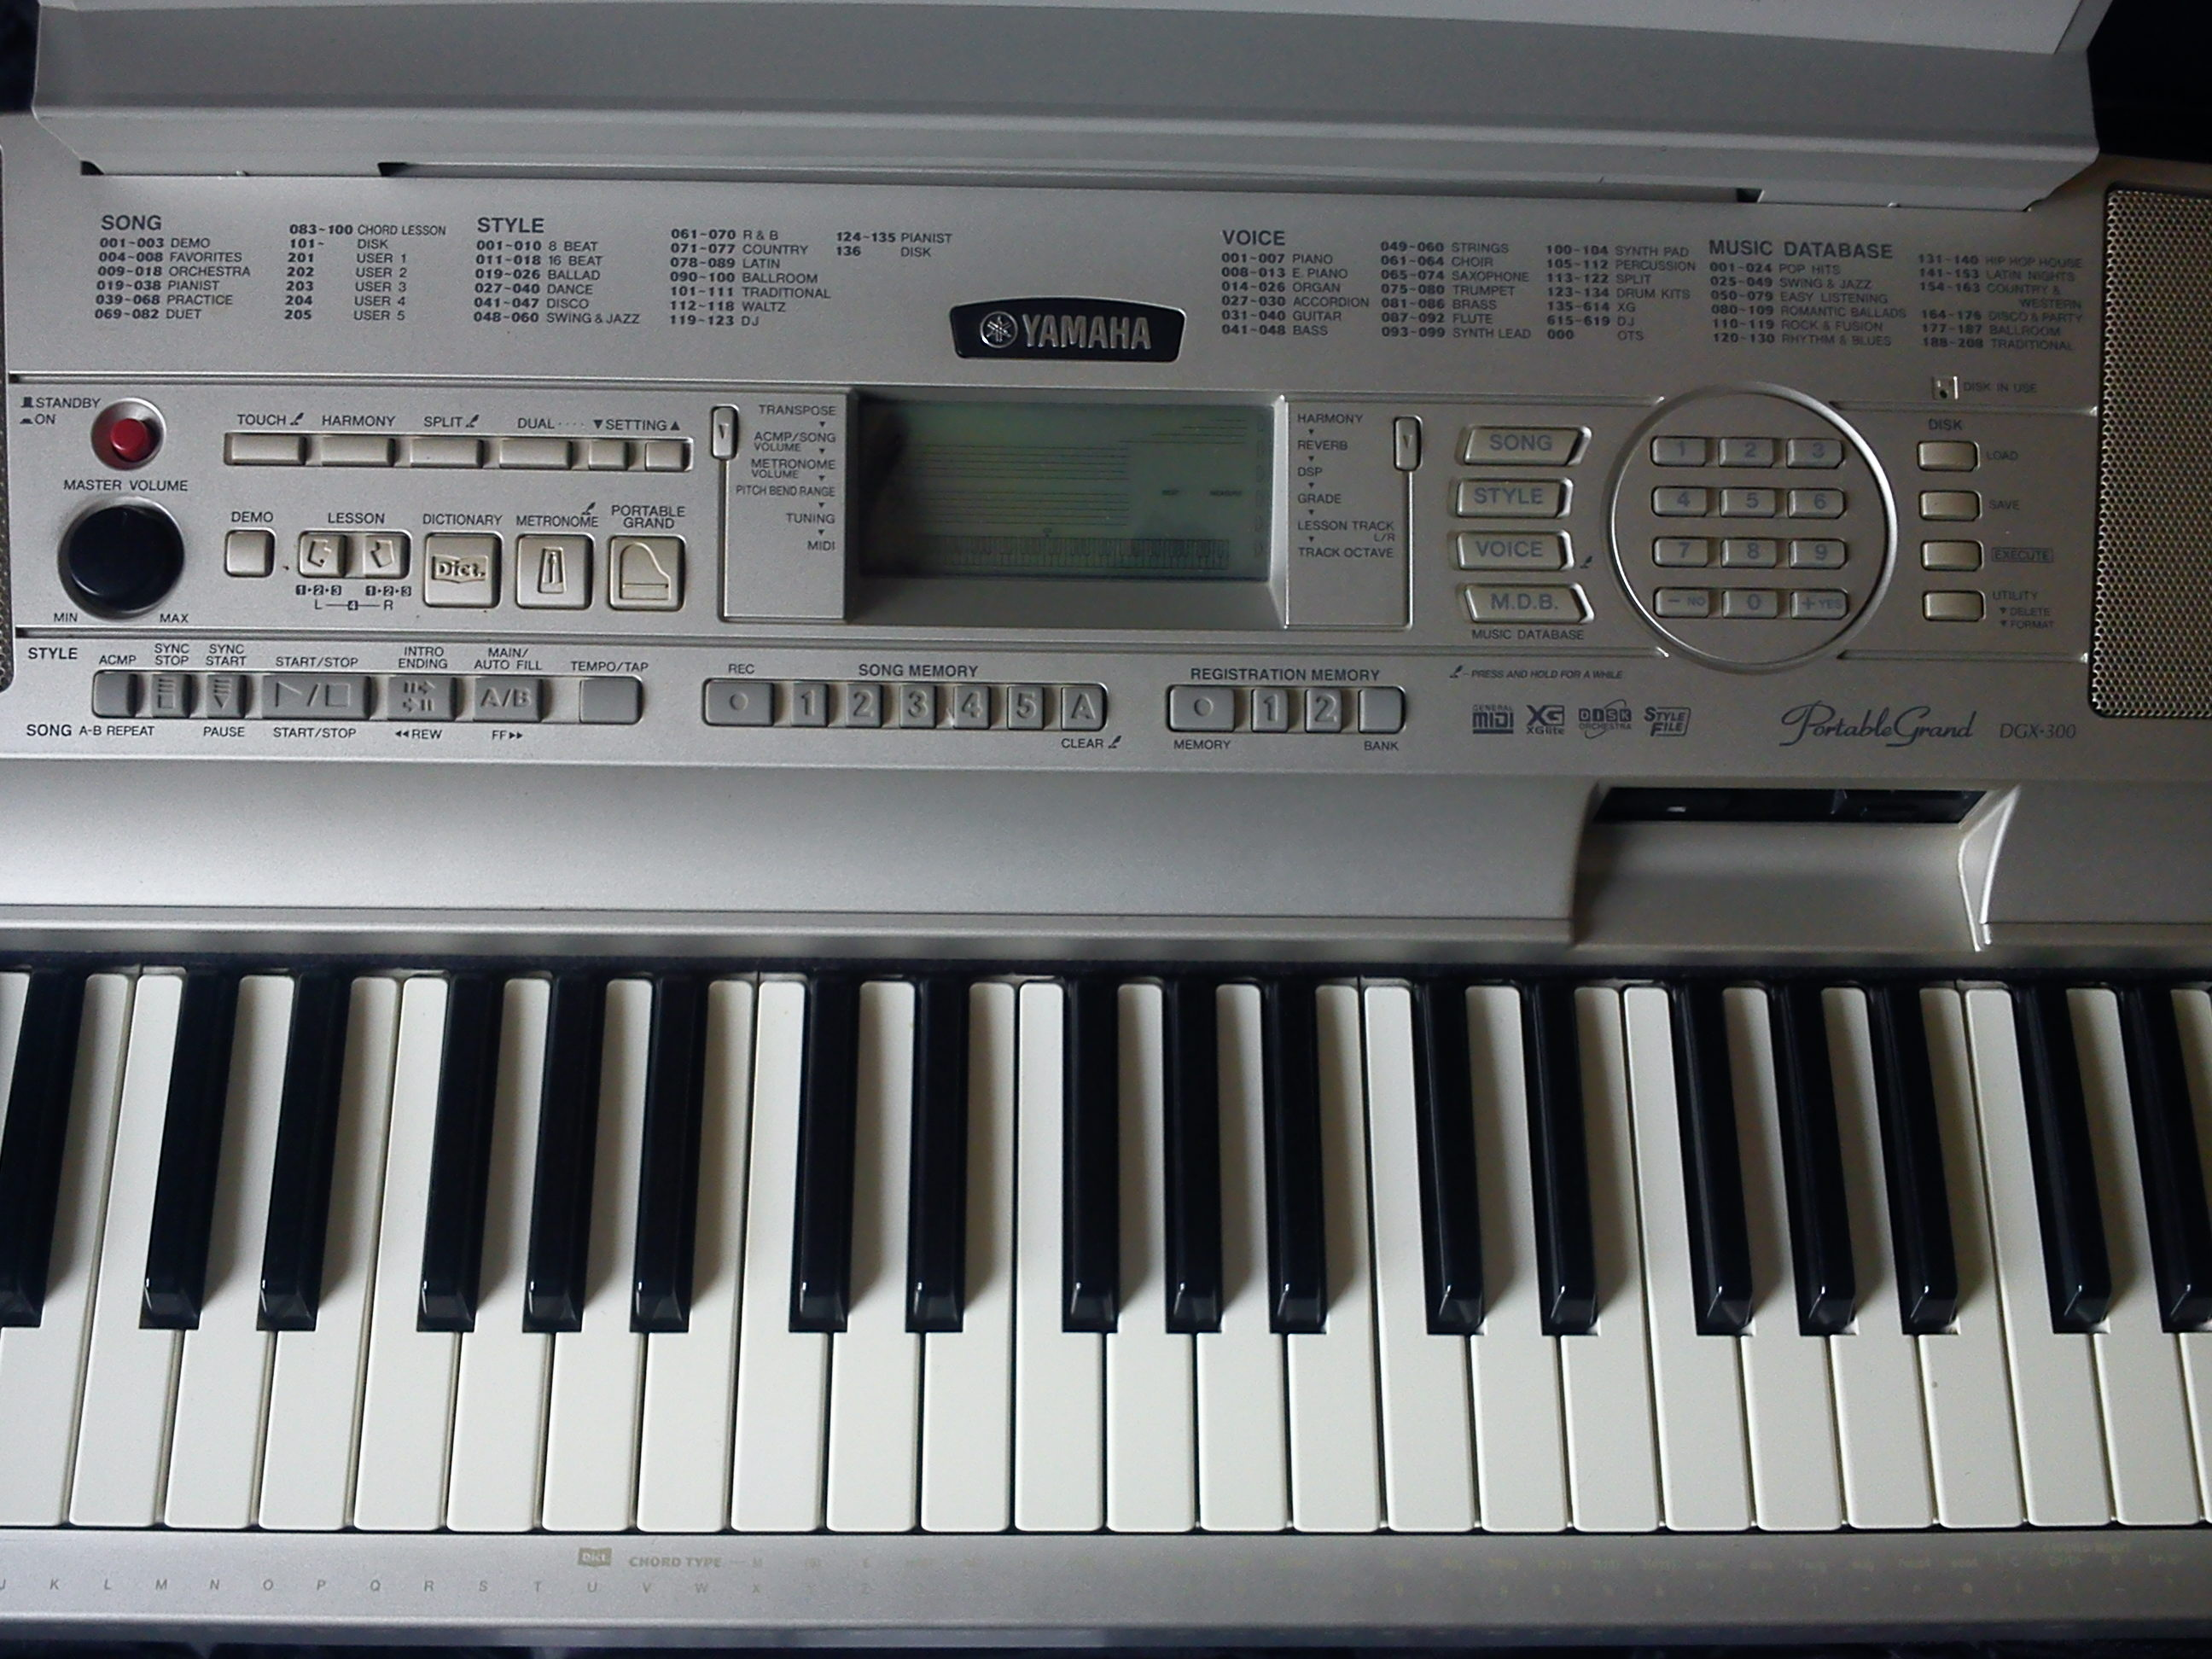 Yamaha dgx 300 image 1674005 audiofanzine for Yamaha dgx 230 manual